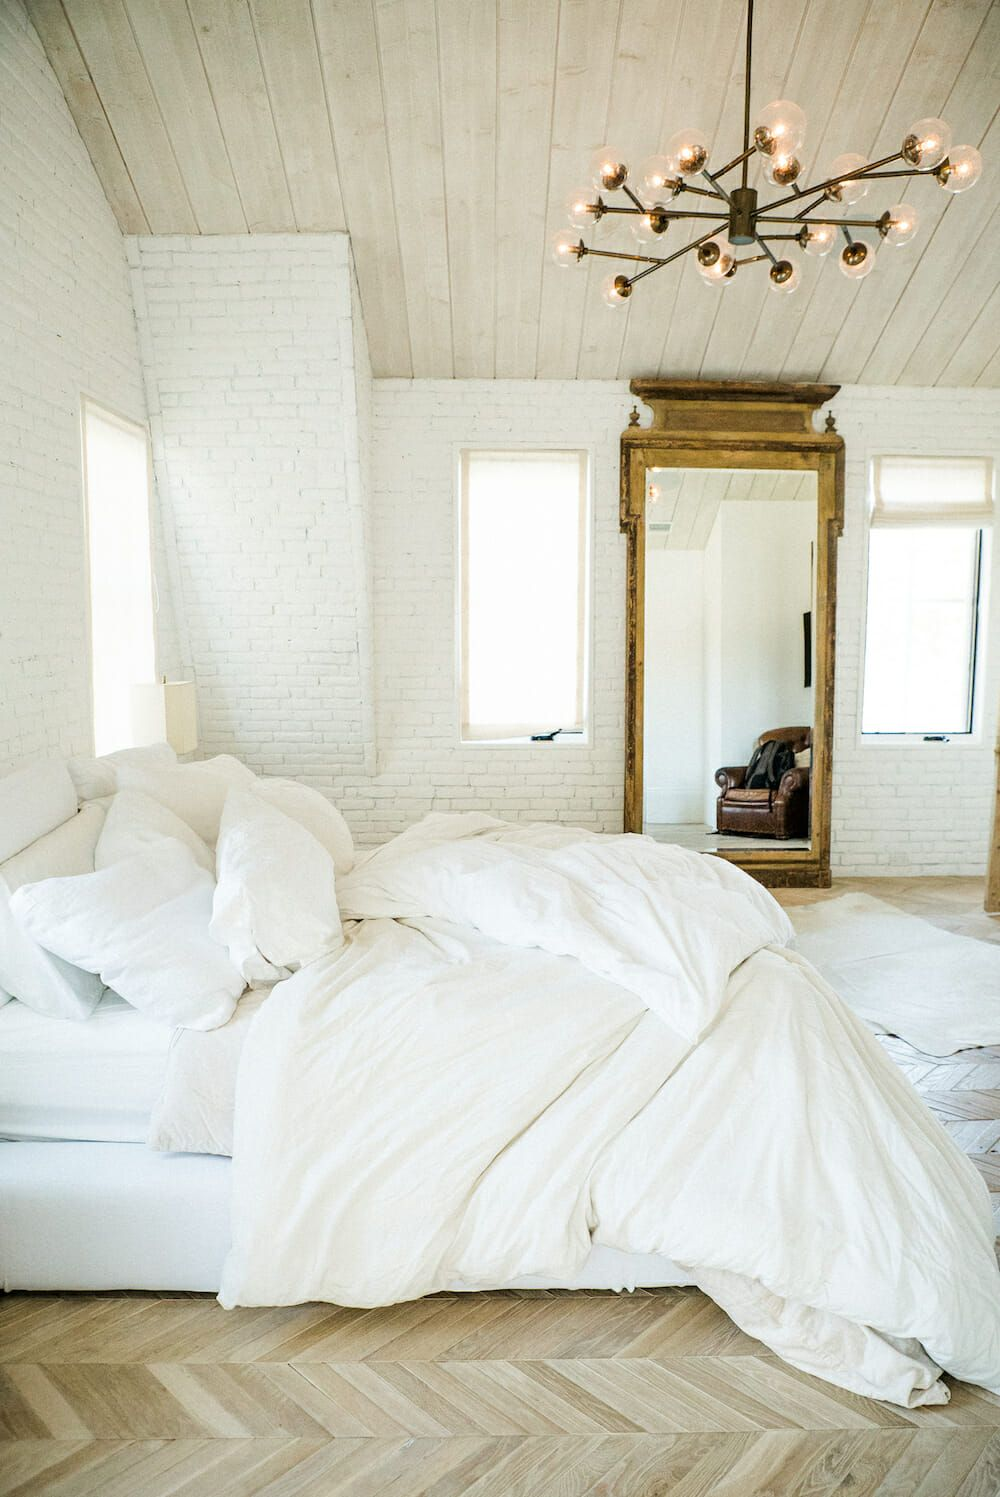 50 stylish bedroom design ideas modern bedrooms decorating tips rh housebeautiful com